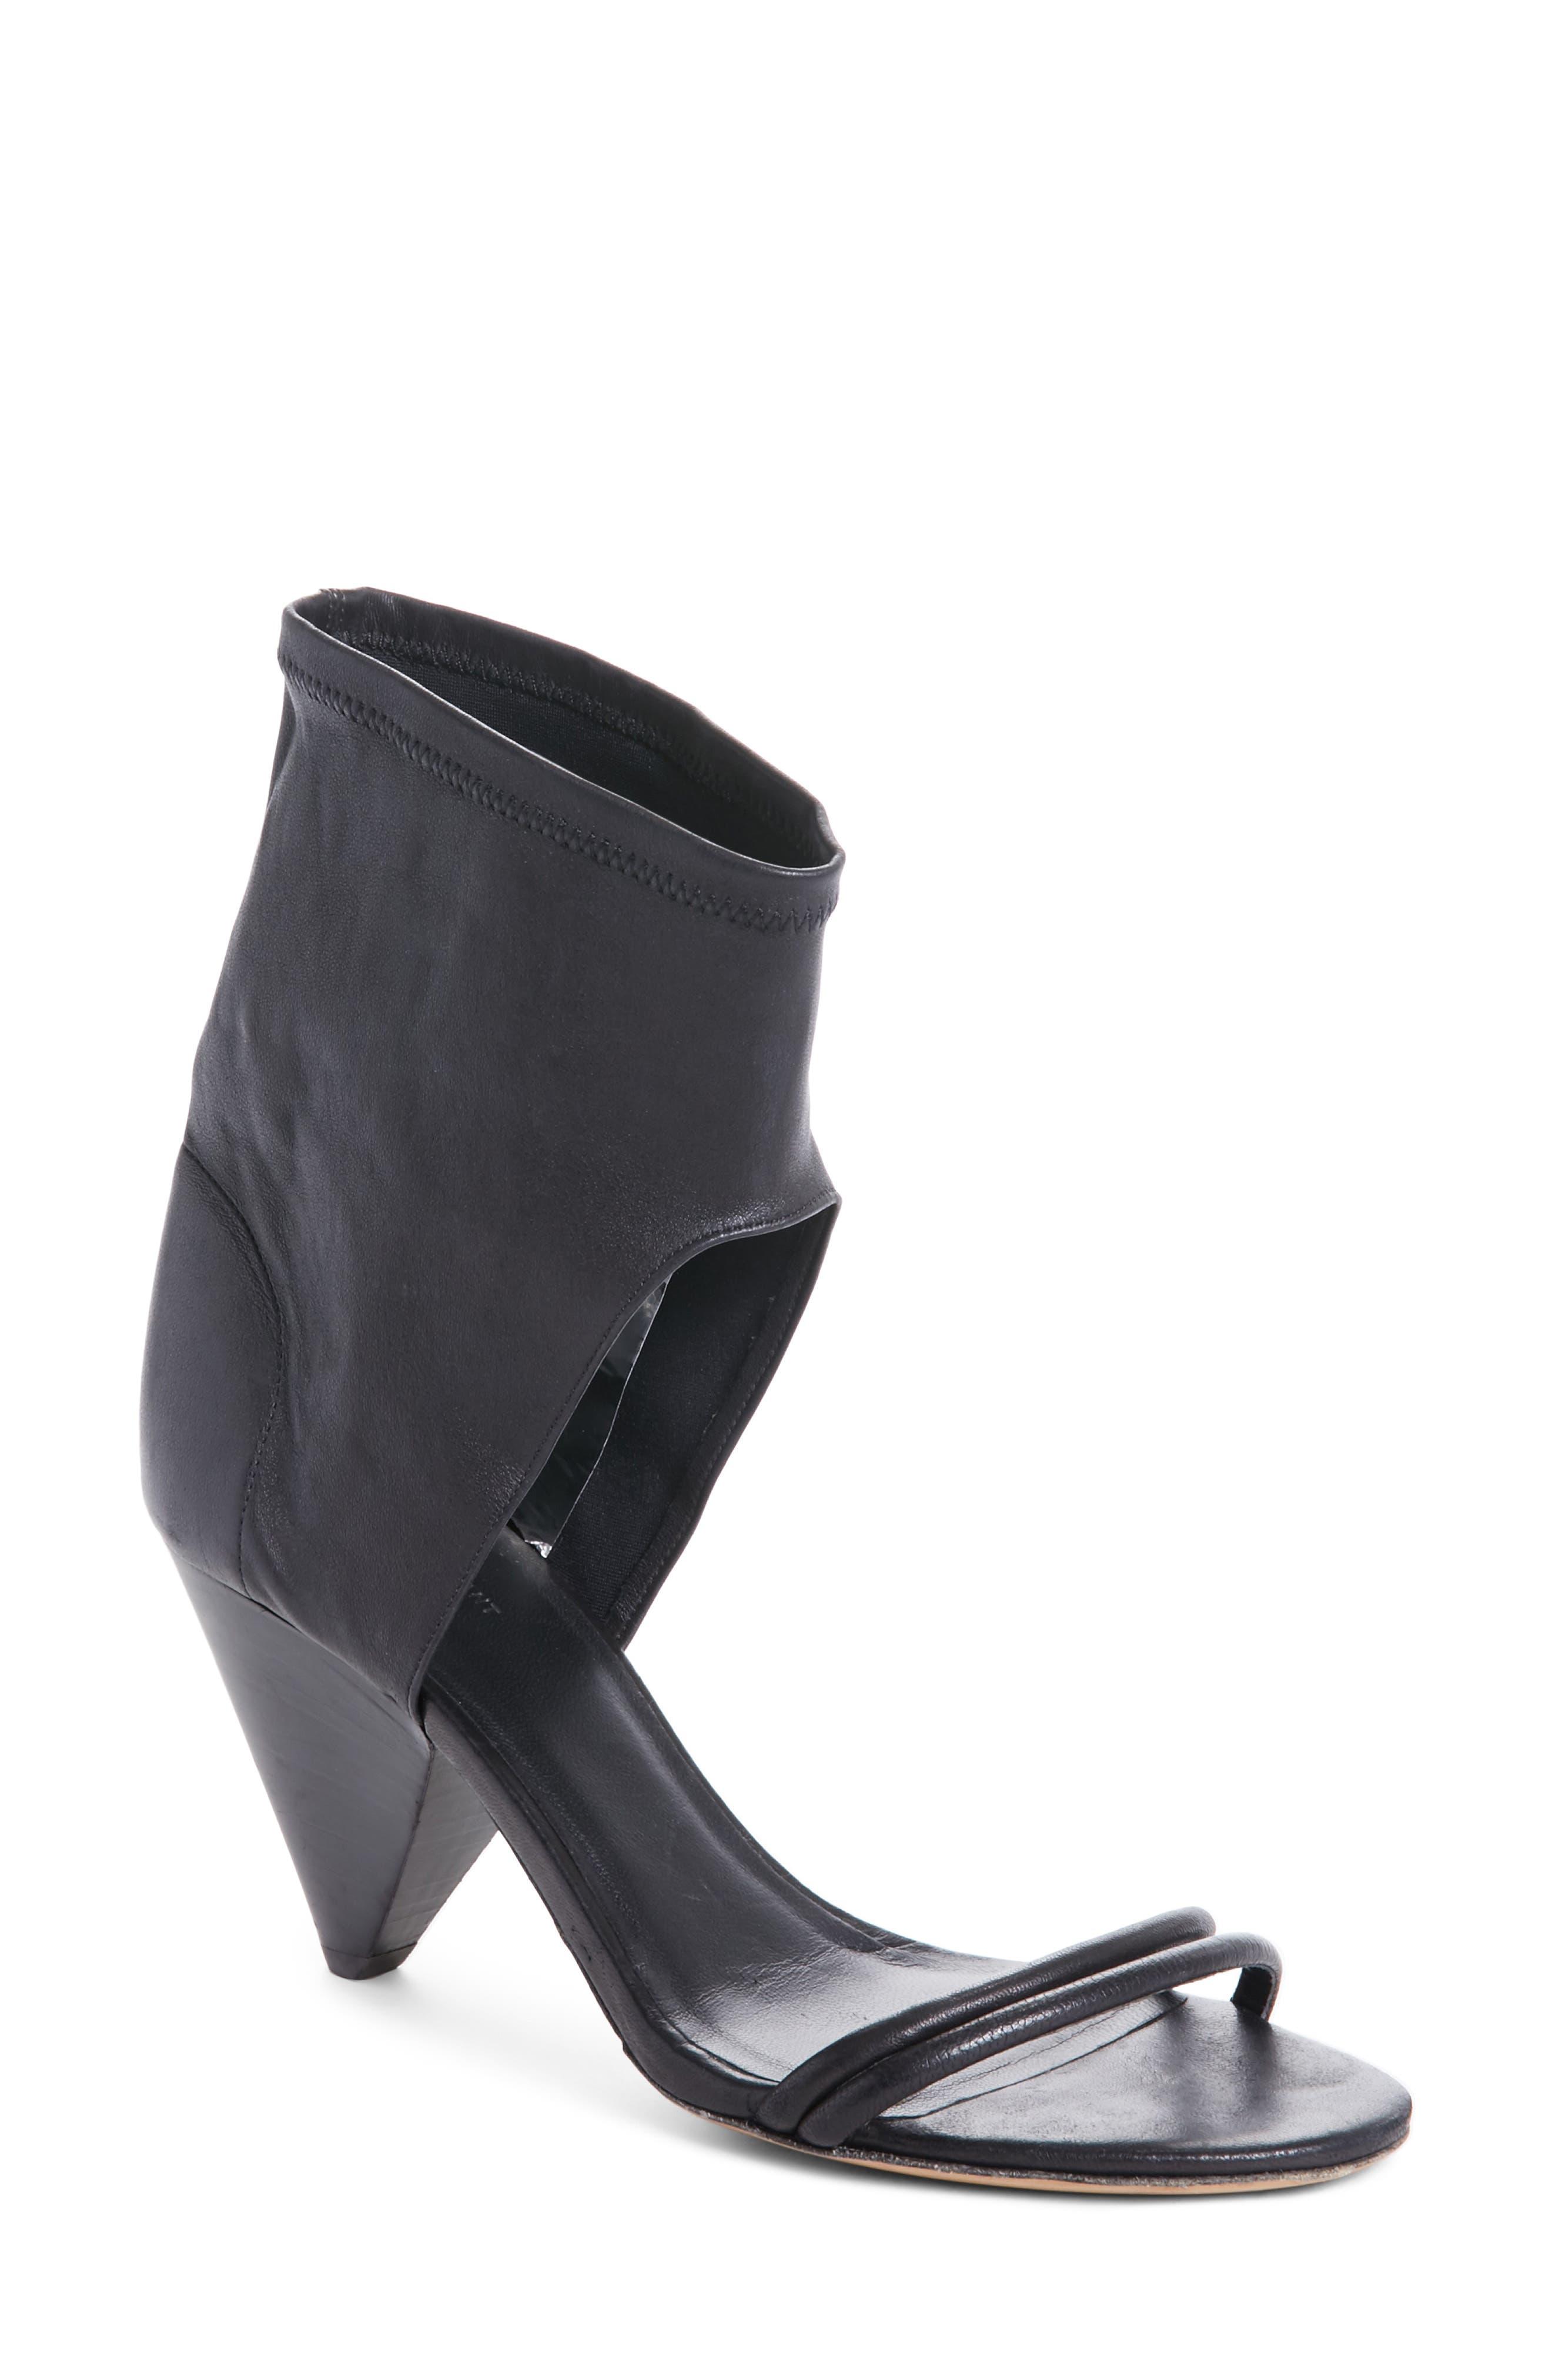 Main Image - Isabel Marant Melvy Ankle Shield Sandal (Women)